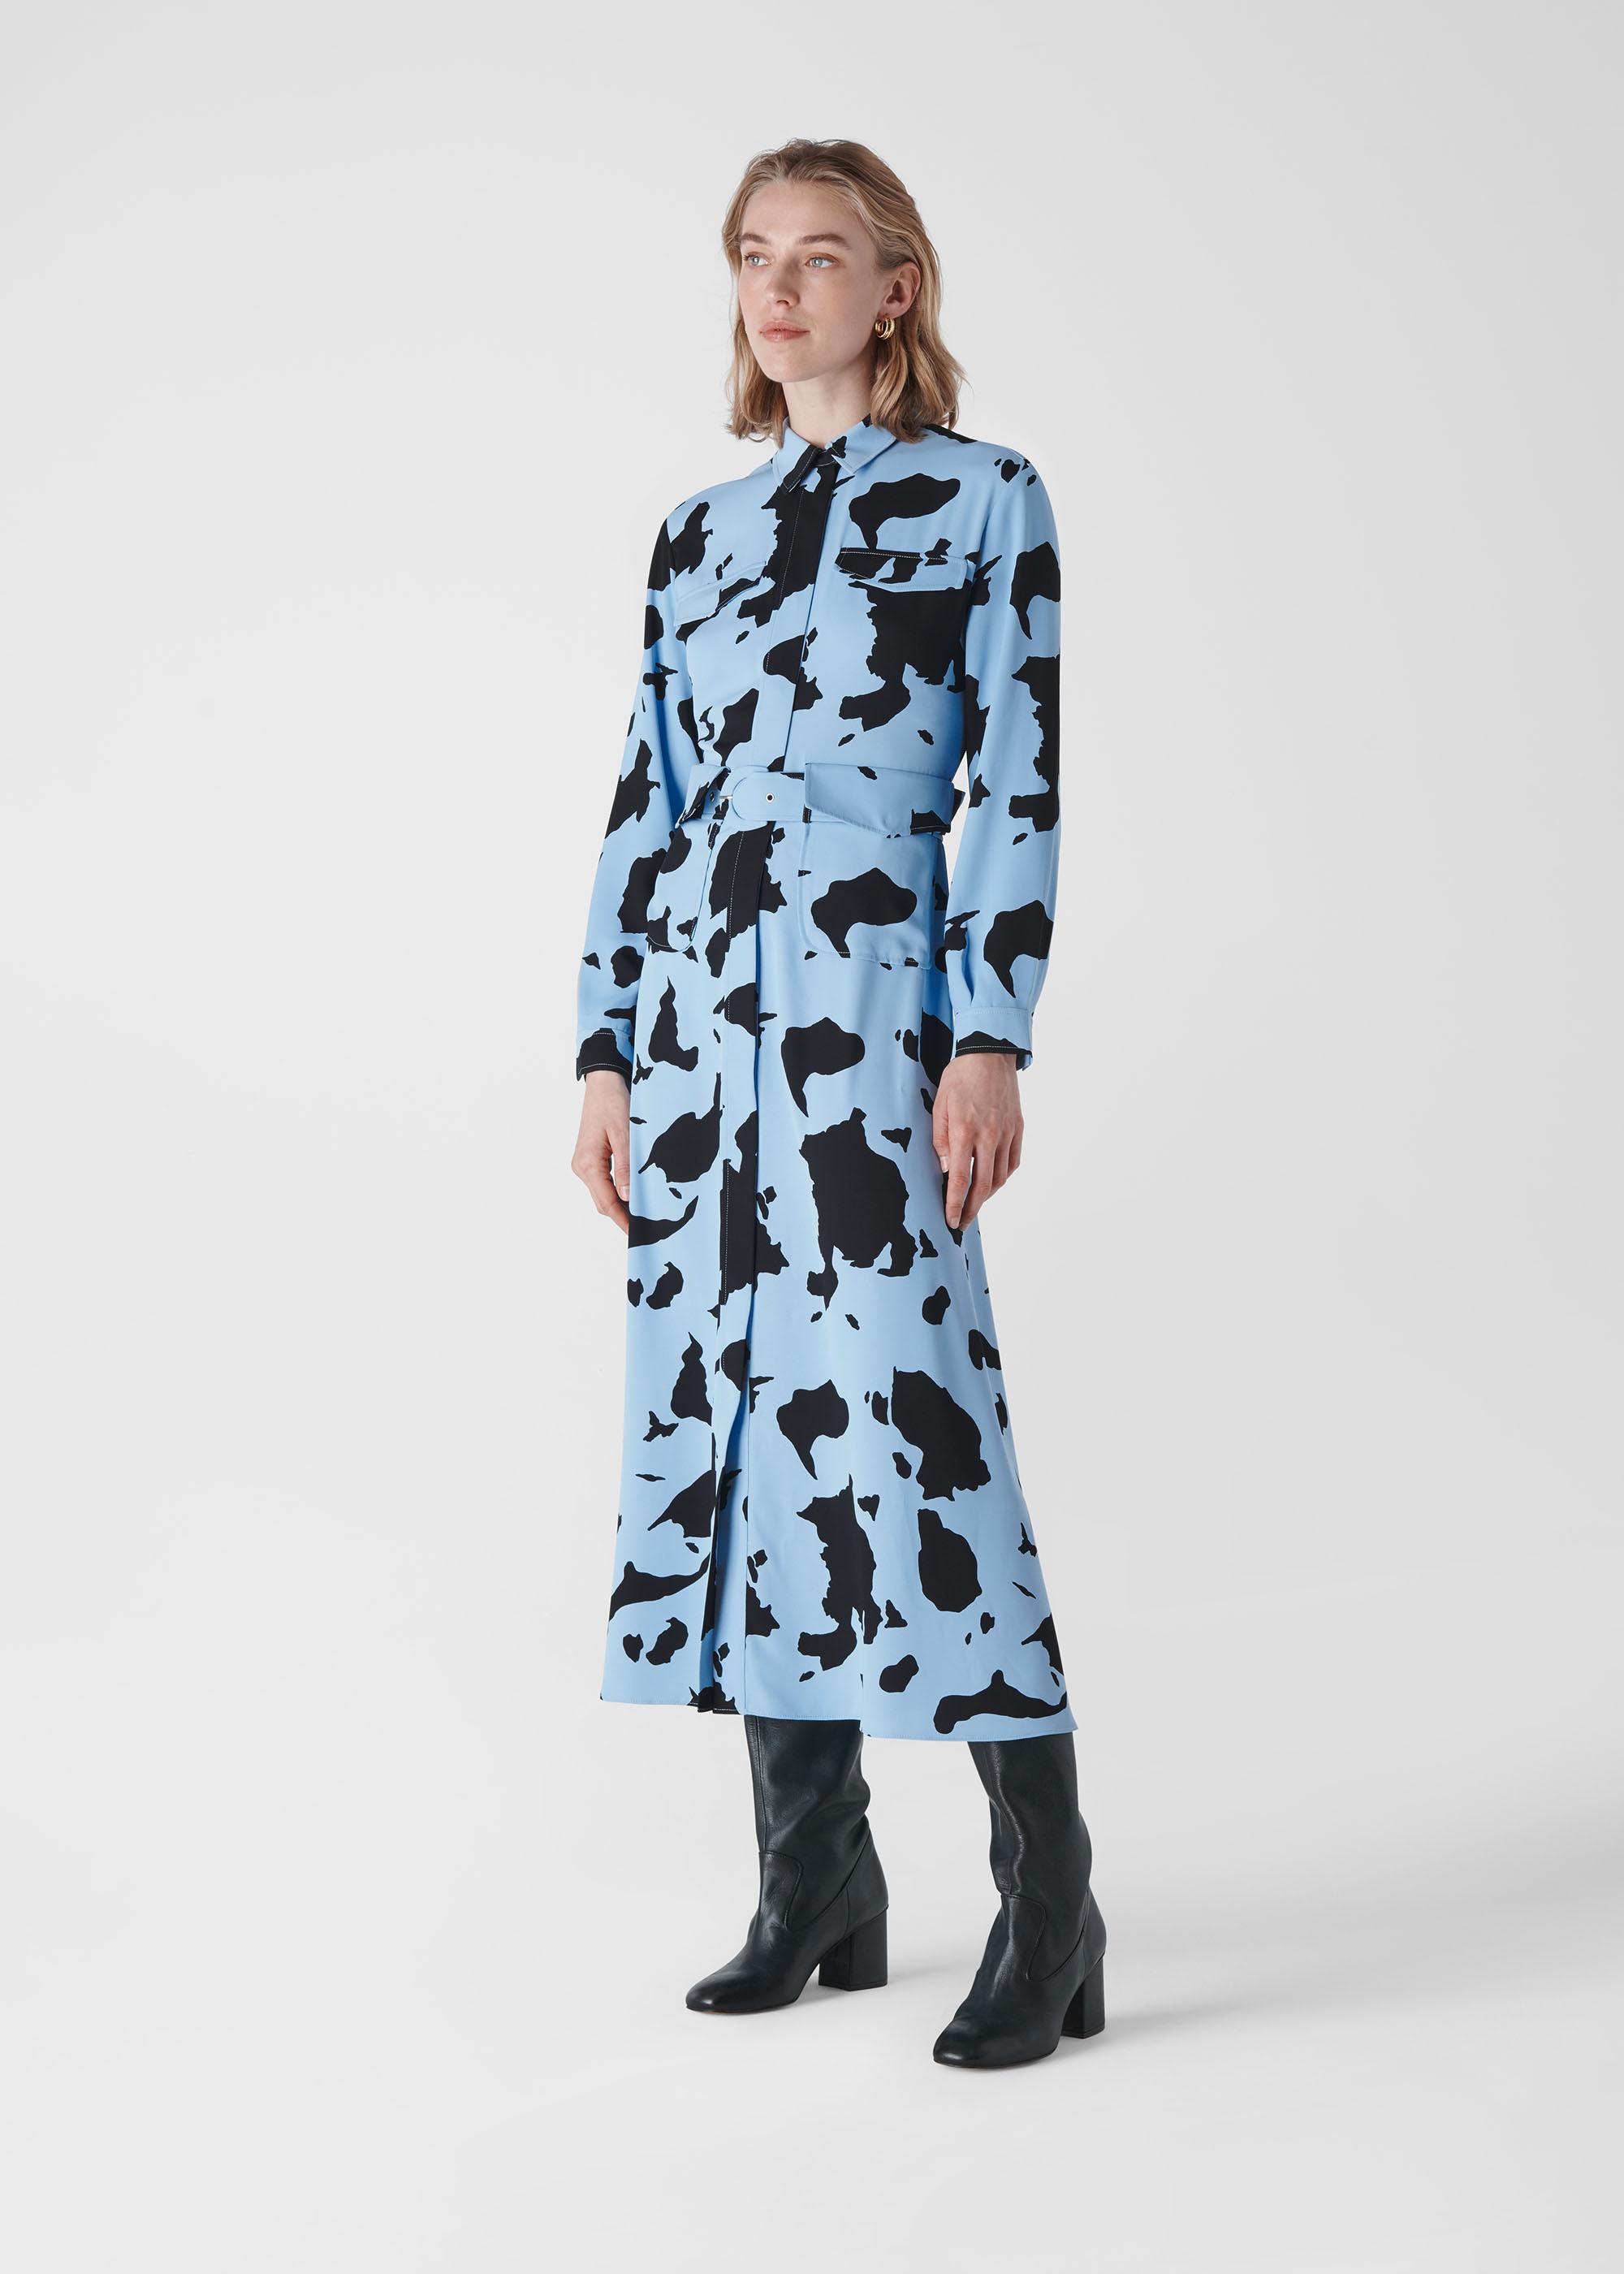 Whistles Women Cow Print Military Dress